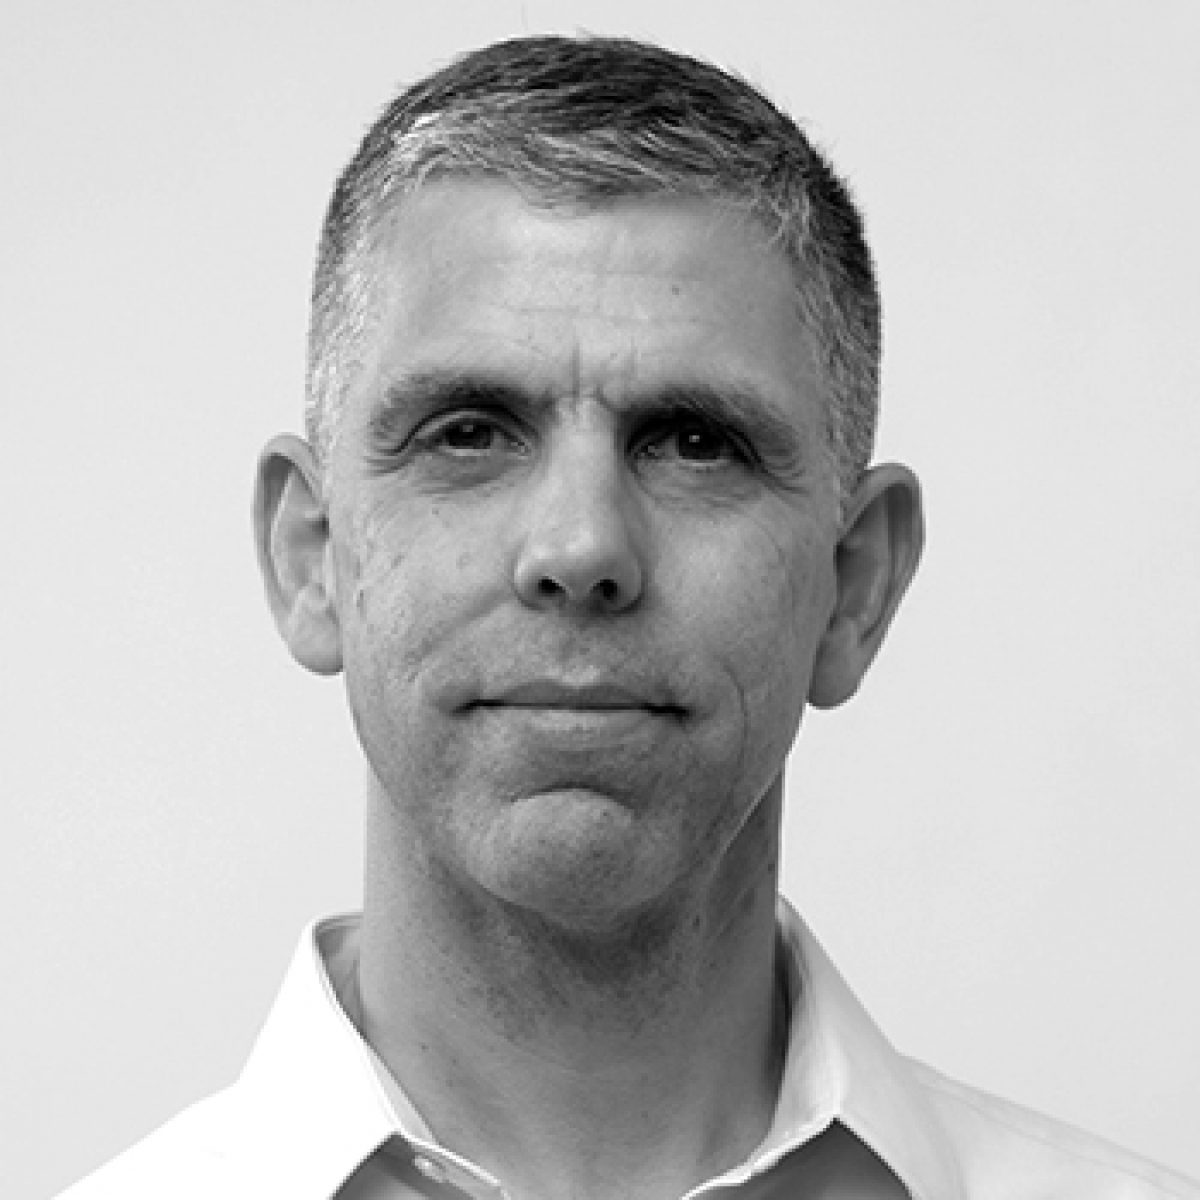 Matthew Kohut